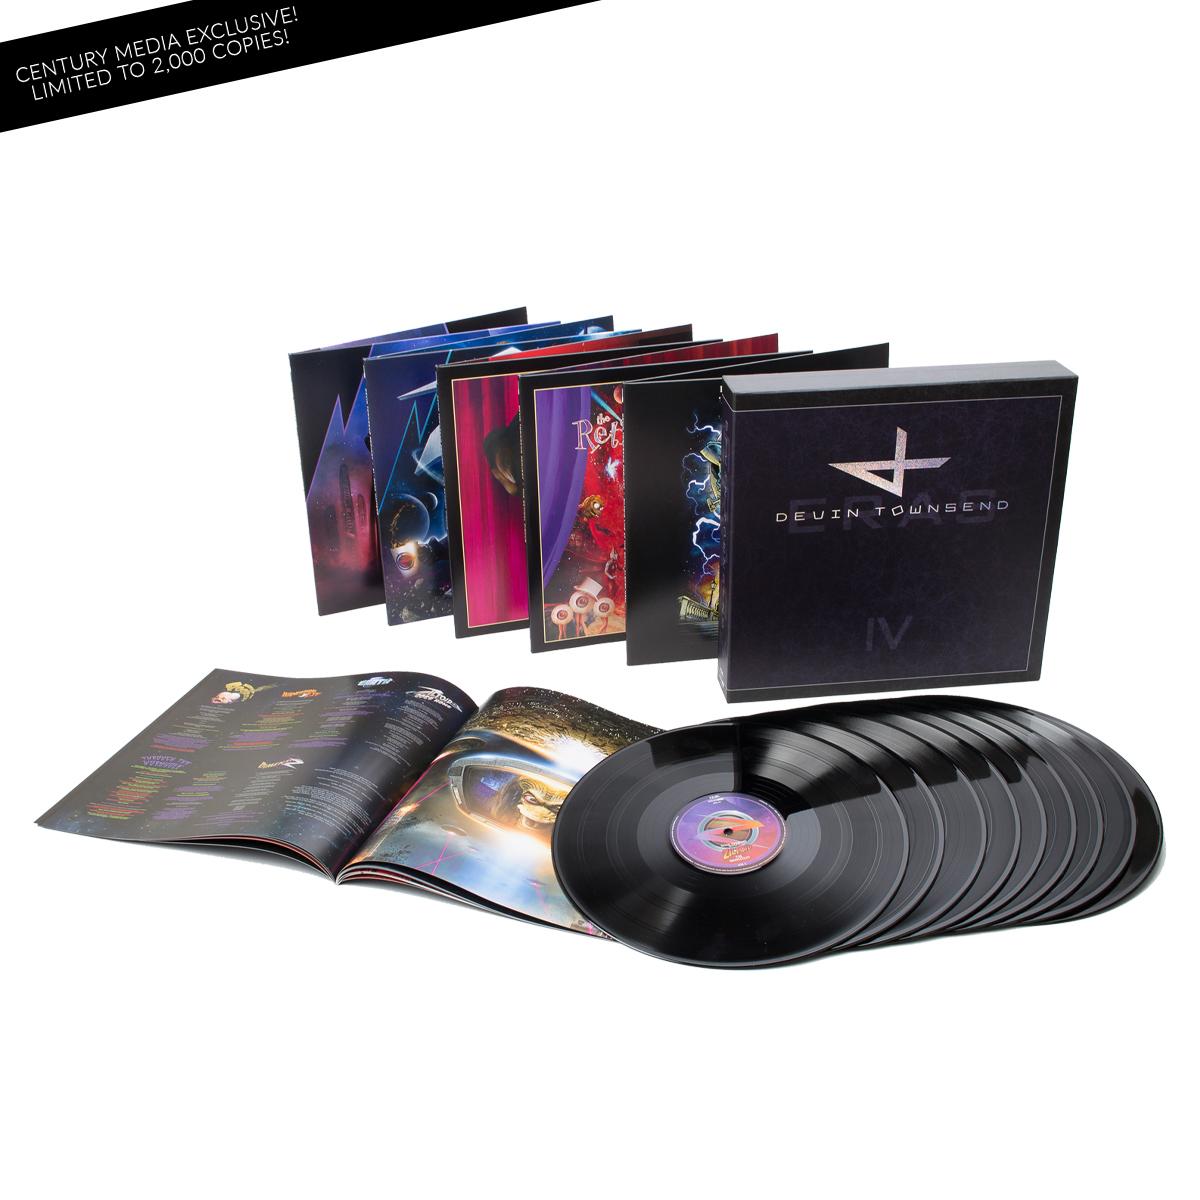 Devin Townsend Project - Eras - Vinyl Collection Part IV 9-LP Limited Edition Deluxe Box Set